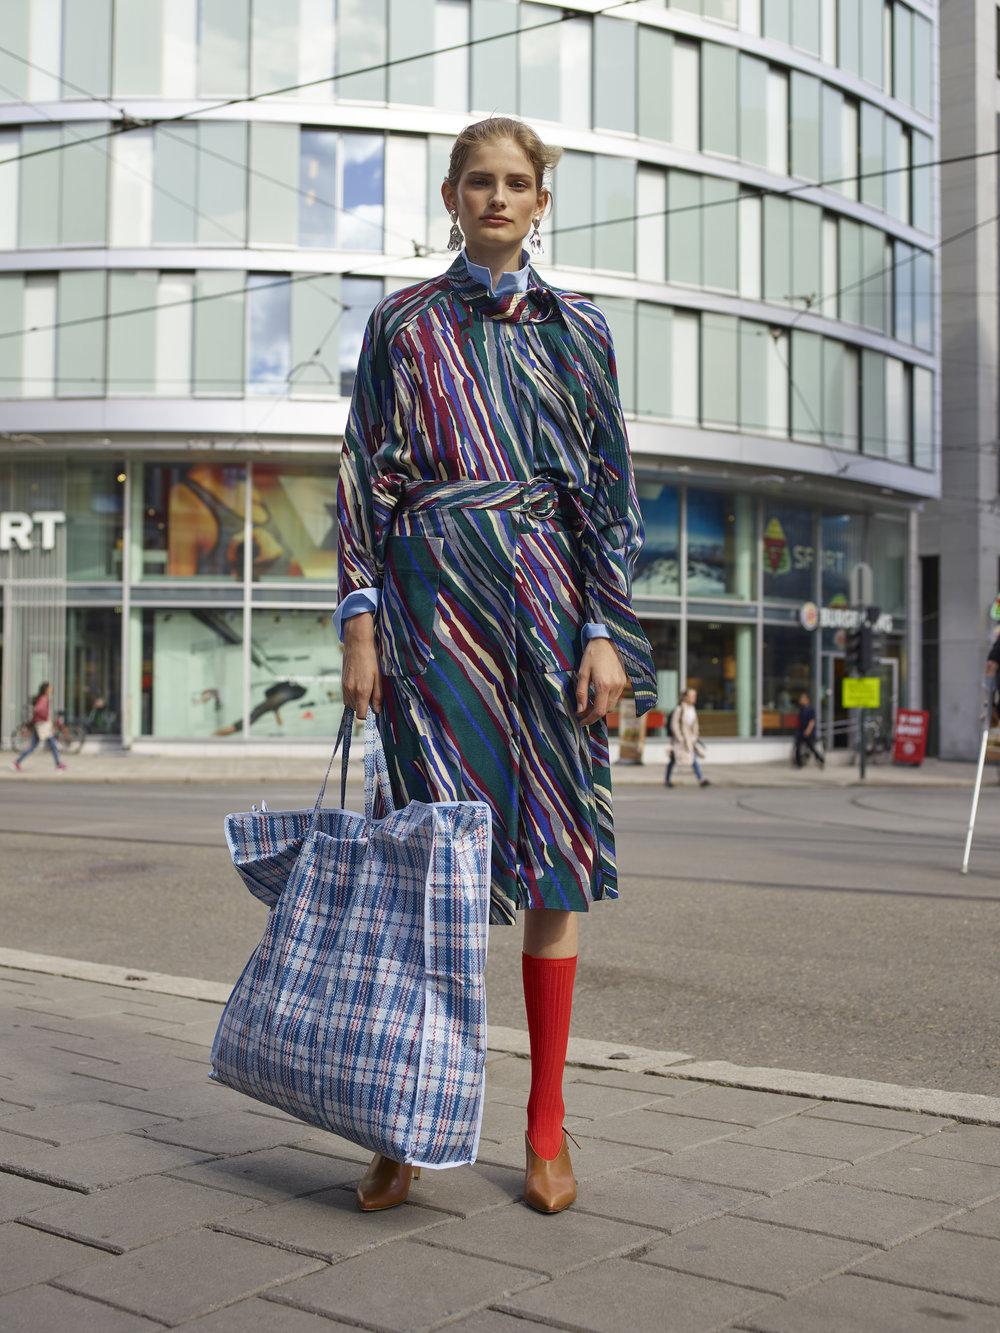 Skjorte - BY MALENE BIRGER Top - RODEBJER Skjørt - RODEBJER Strømper - MONKI Sko - A.T.P. Ørdobber - ANNIE BERNER